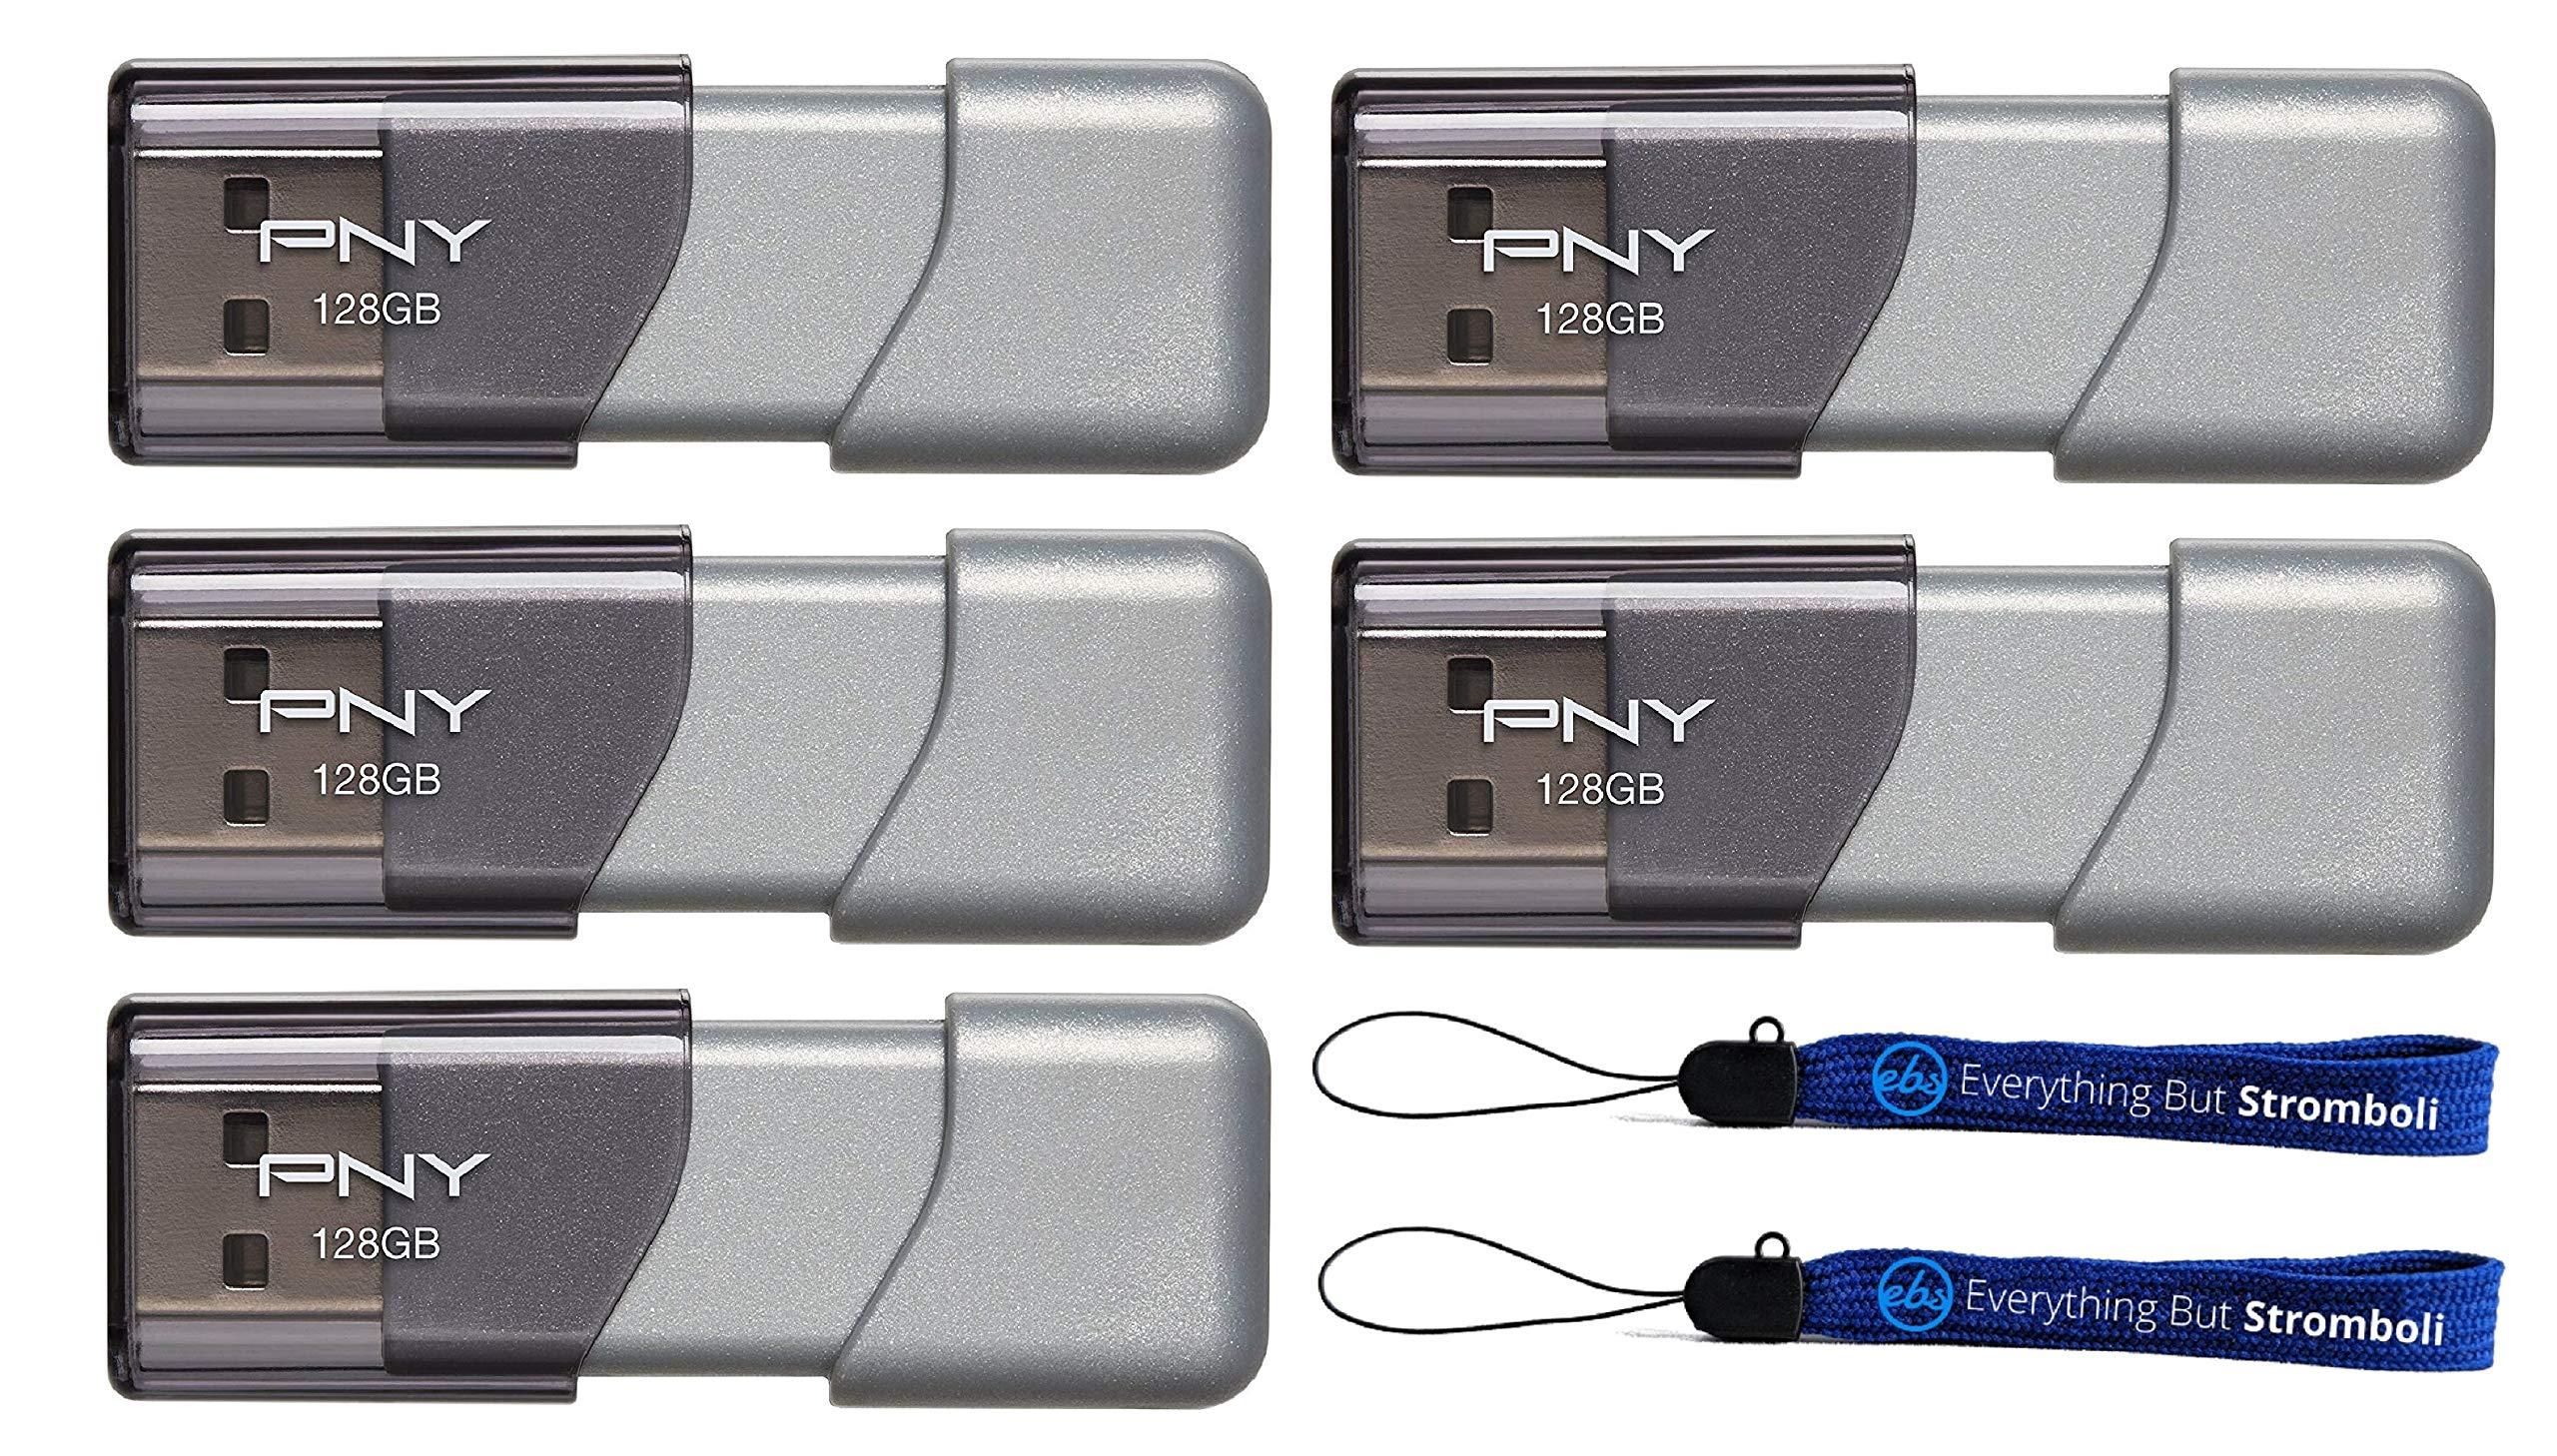 PNY 128GB USB 3.0 Flash Drive Elite Turbo Attache 3 (Five Pack Bundle) Model P-FD128TBOP-GE Plus (2) Everything But Stromboli (TM) Lanyard